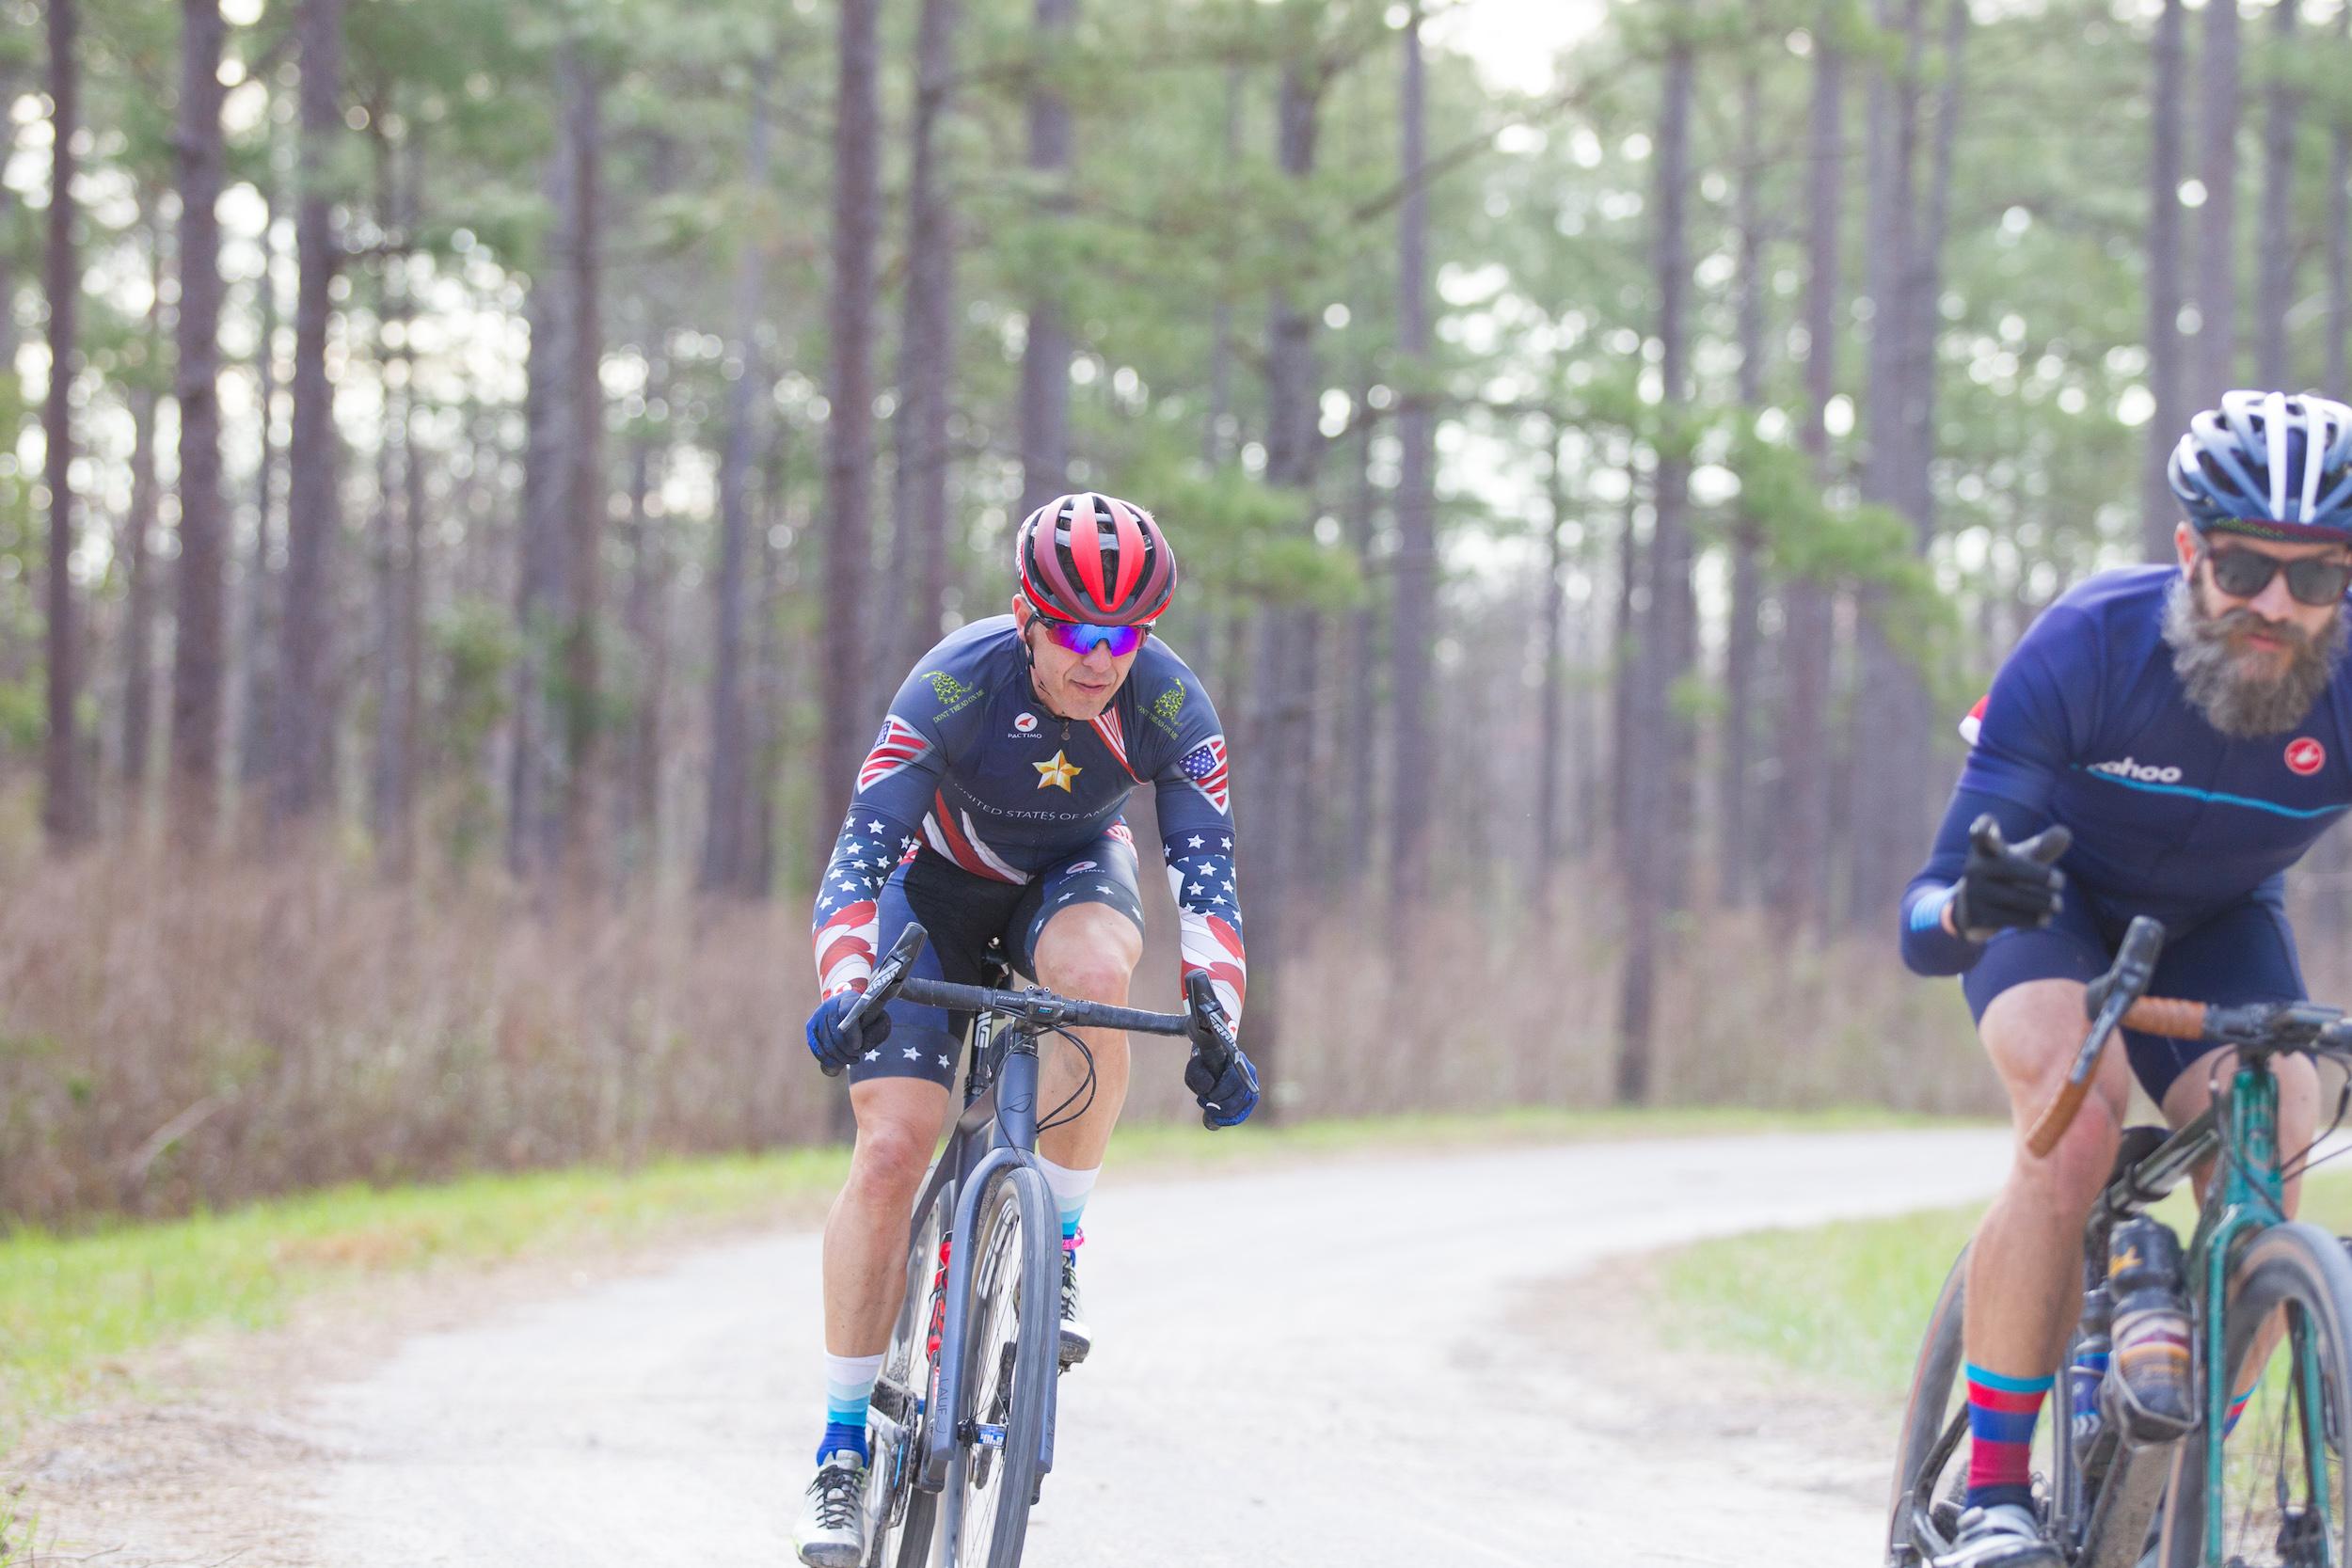 Clint Williams on his Lauf True Grit. PC: Jack Looney